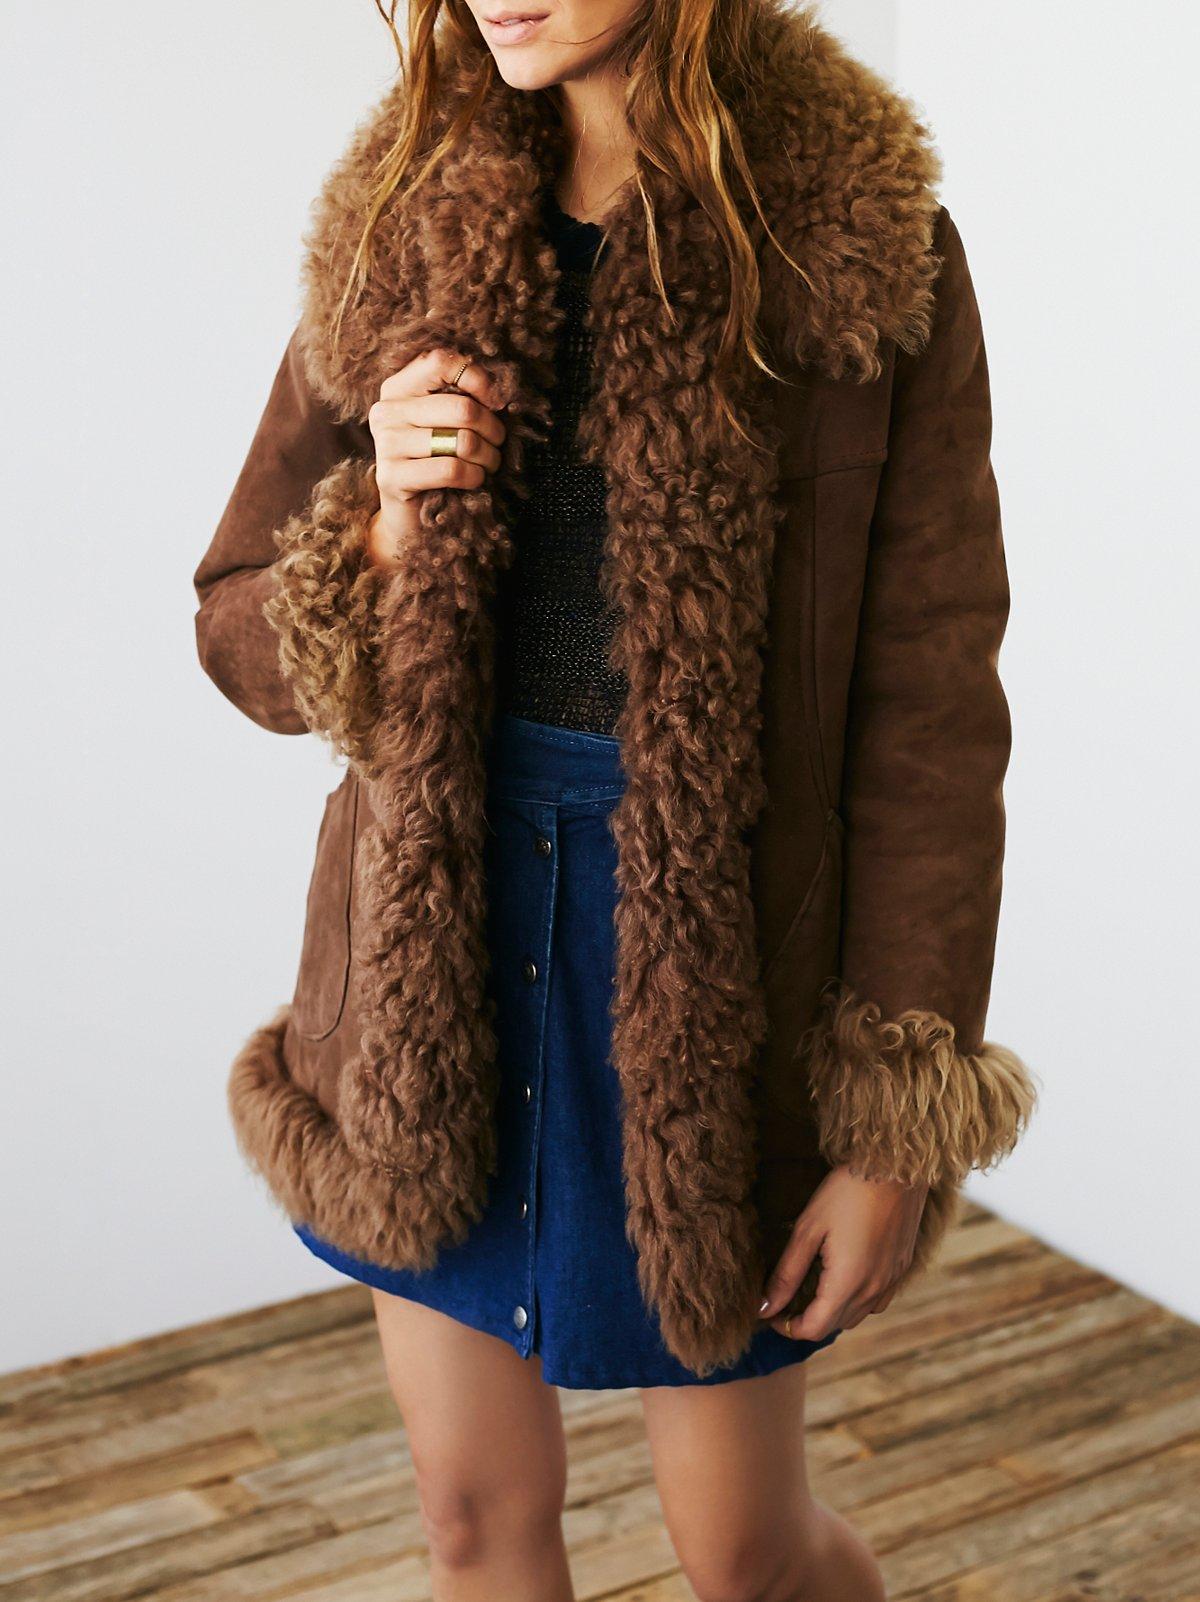 Vintage 1970s Sheepskin Jacket